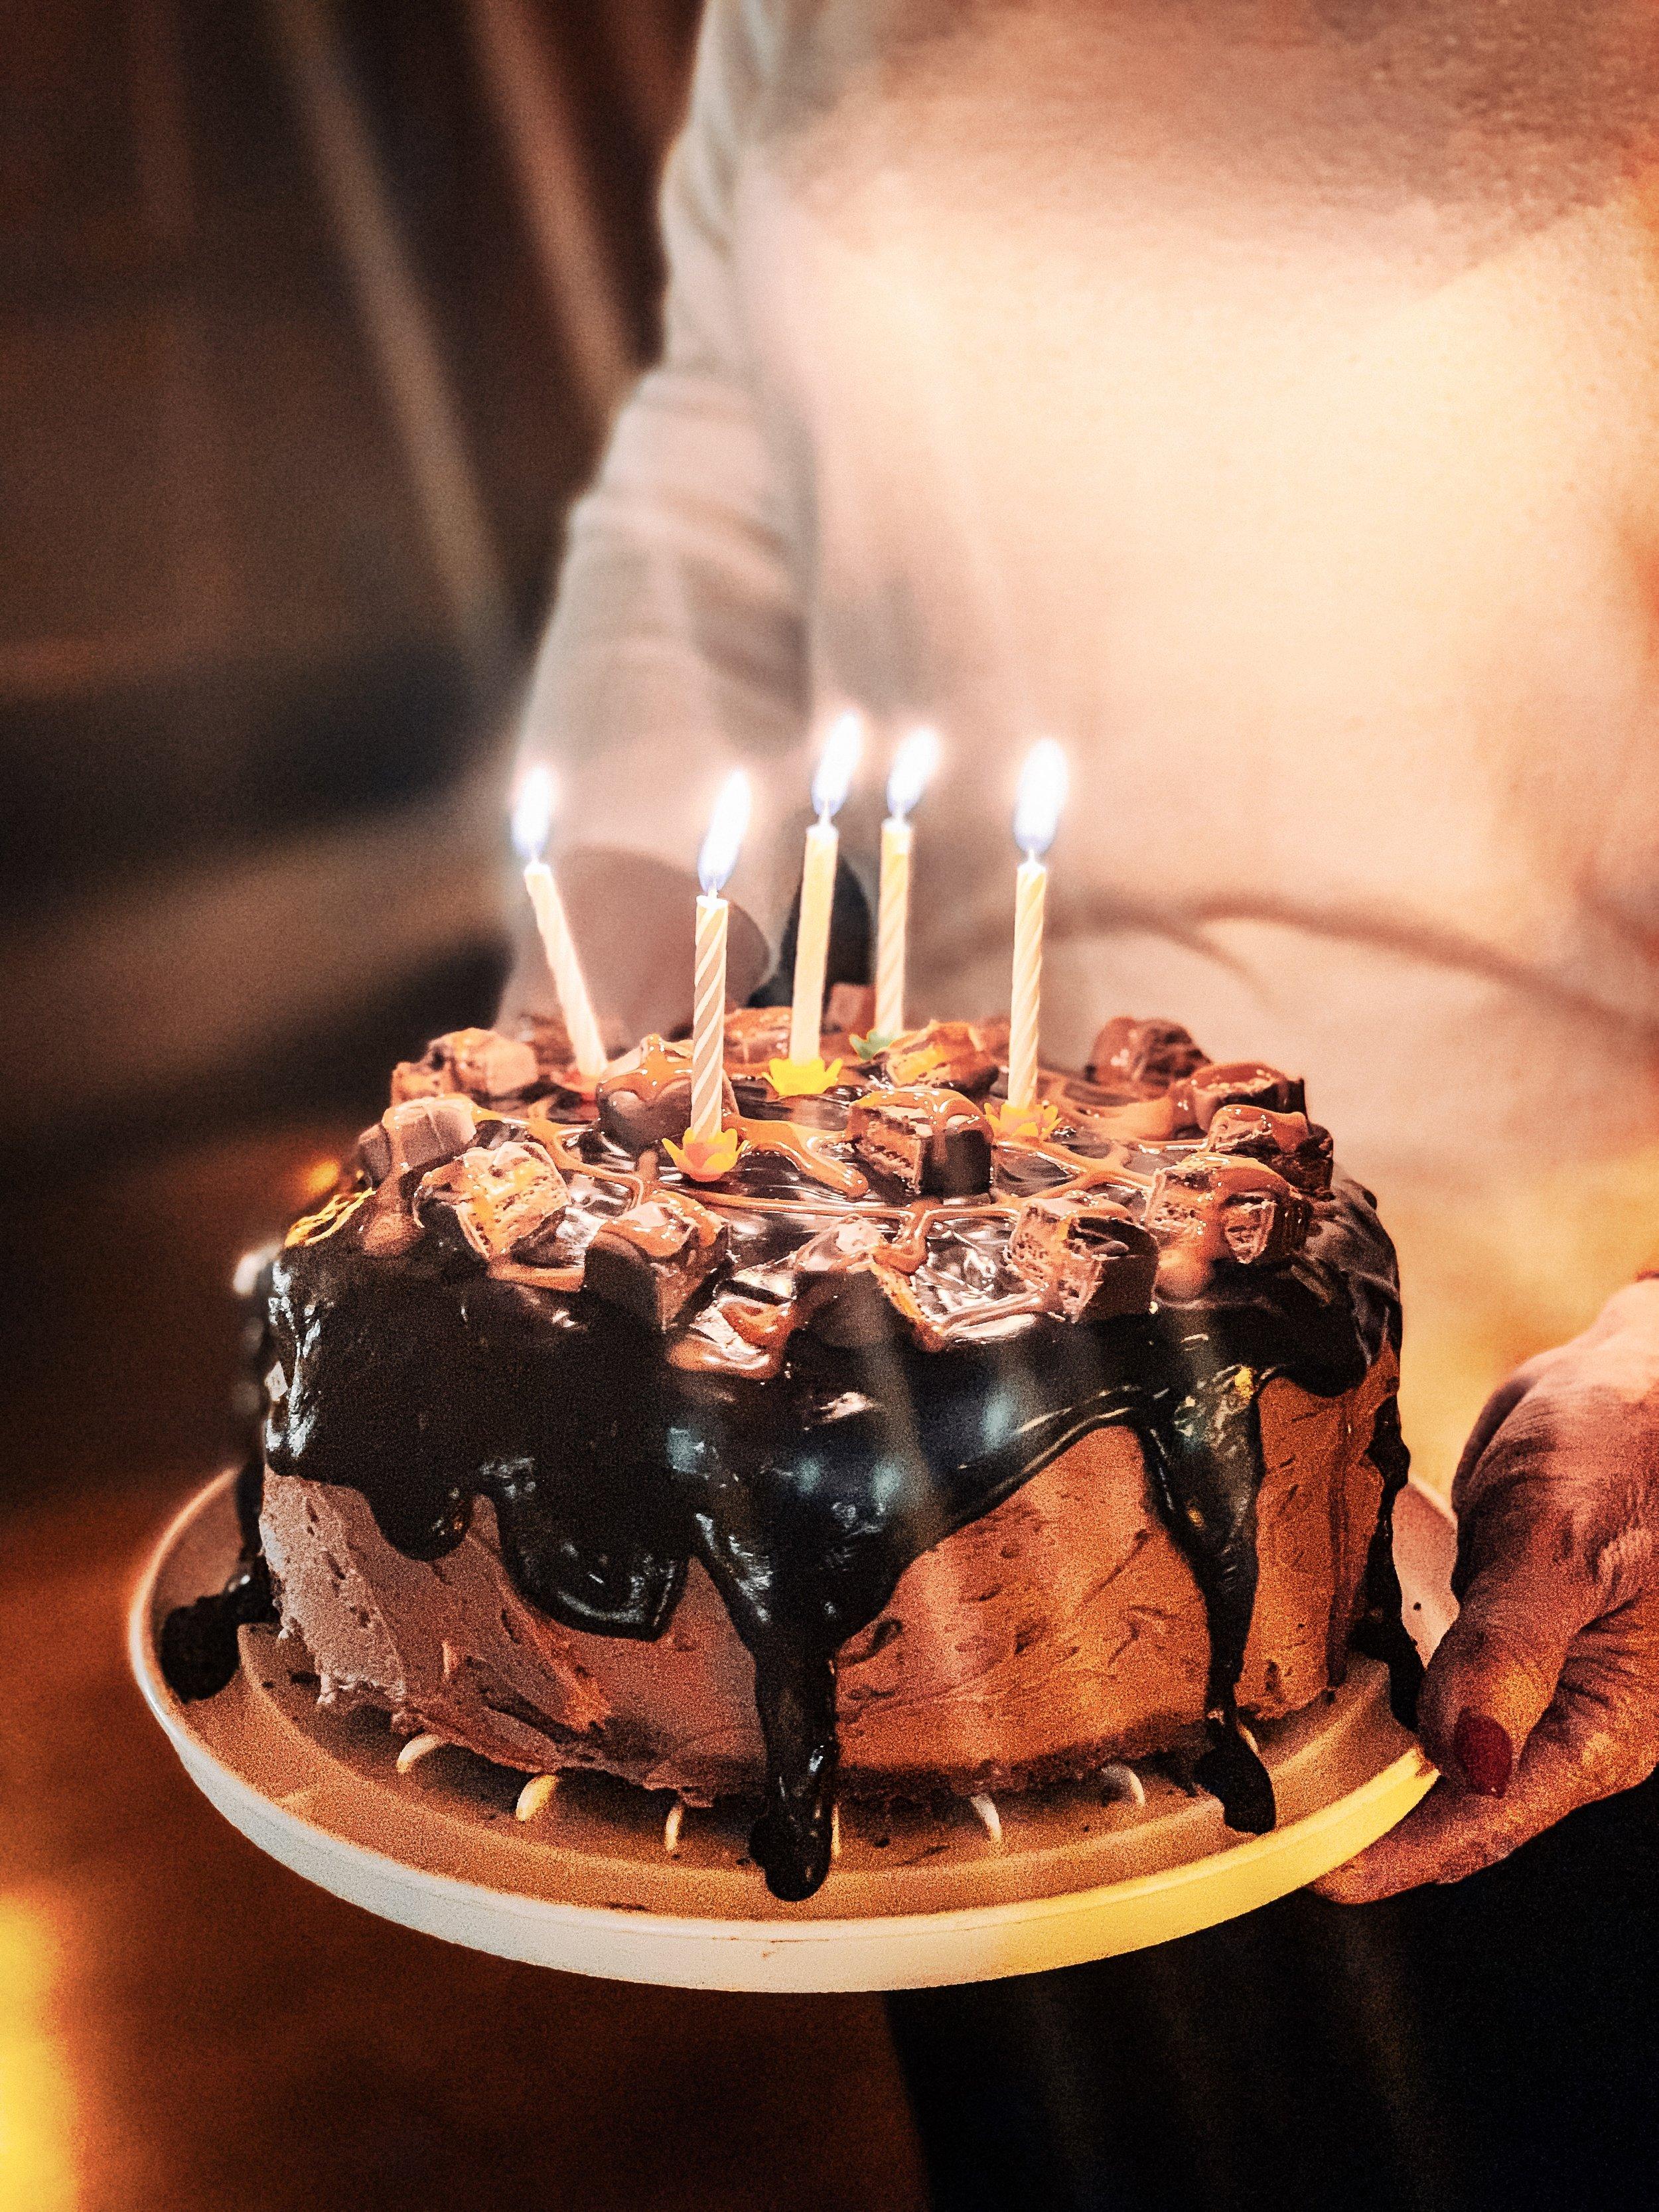 Christmas Carnivore Diet Break Carbohydrate binge Mars Bar Birthday Cake